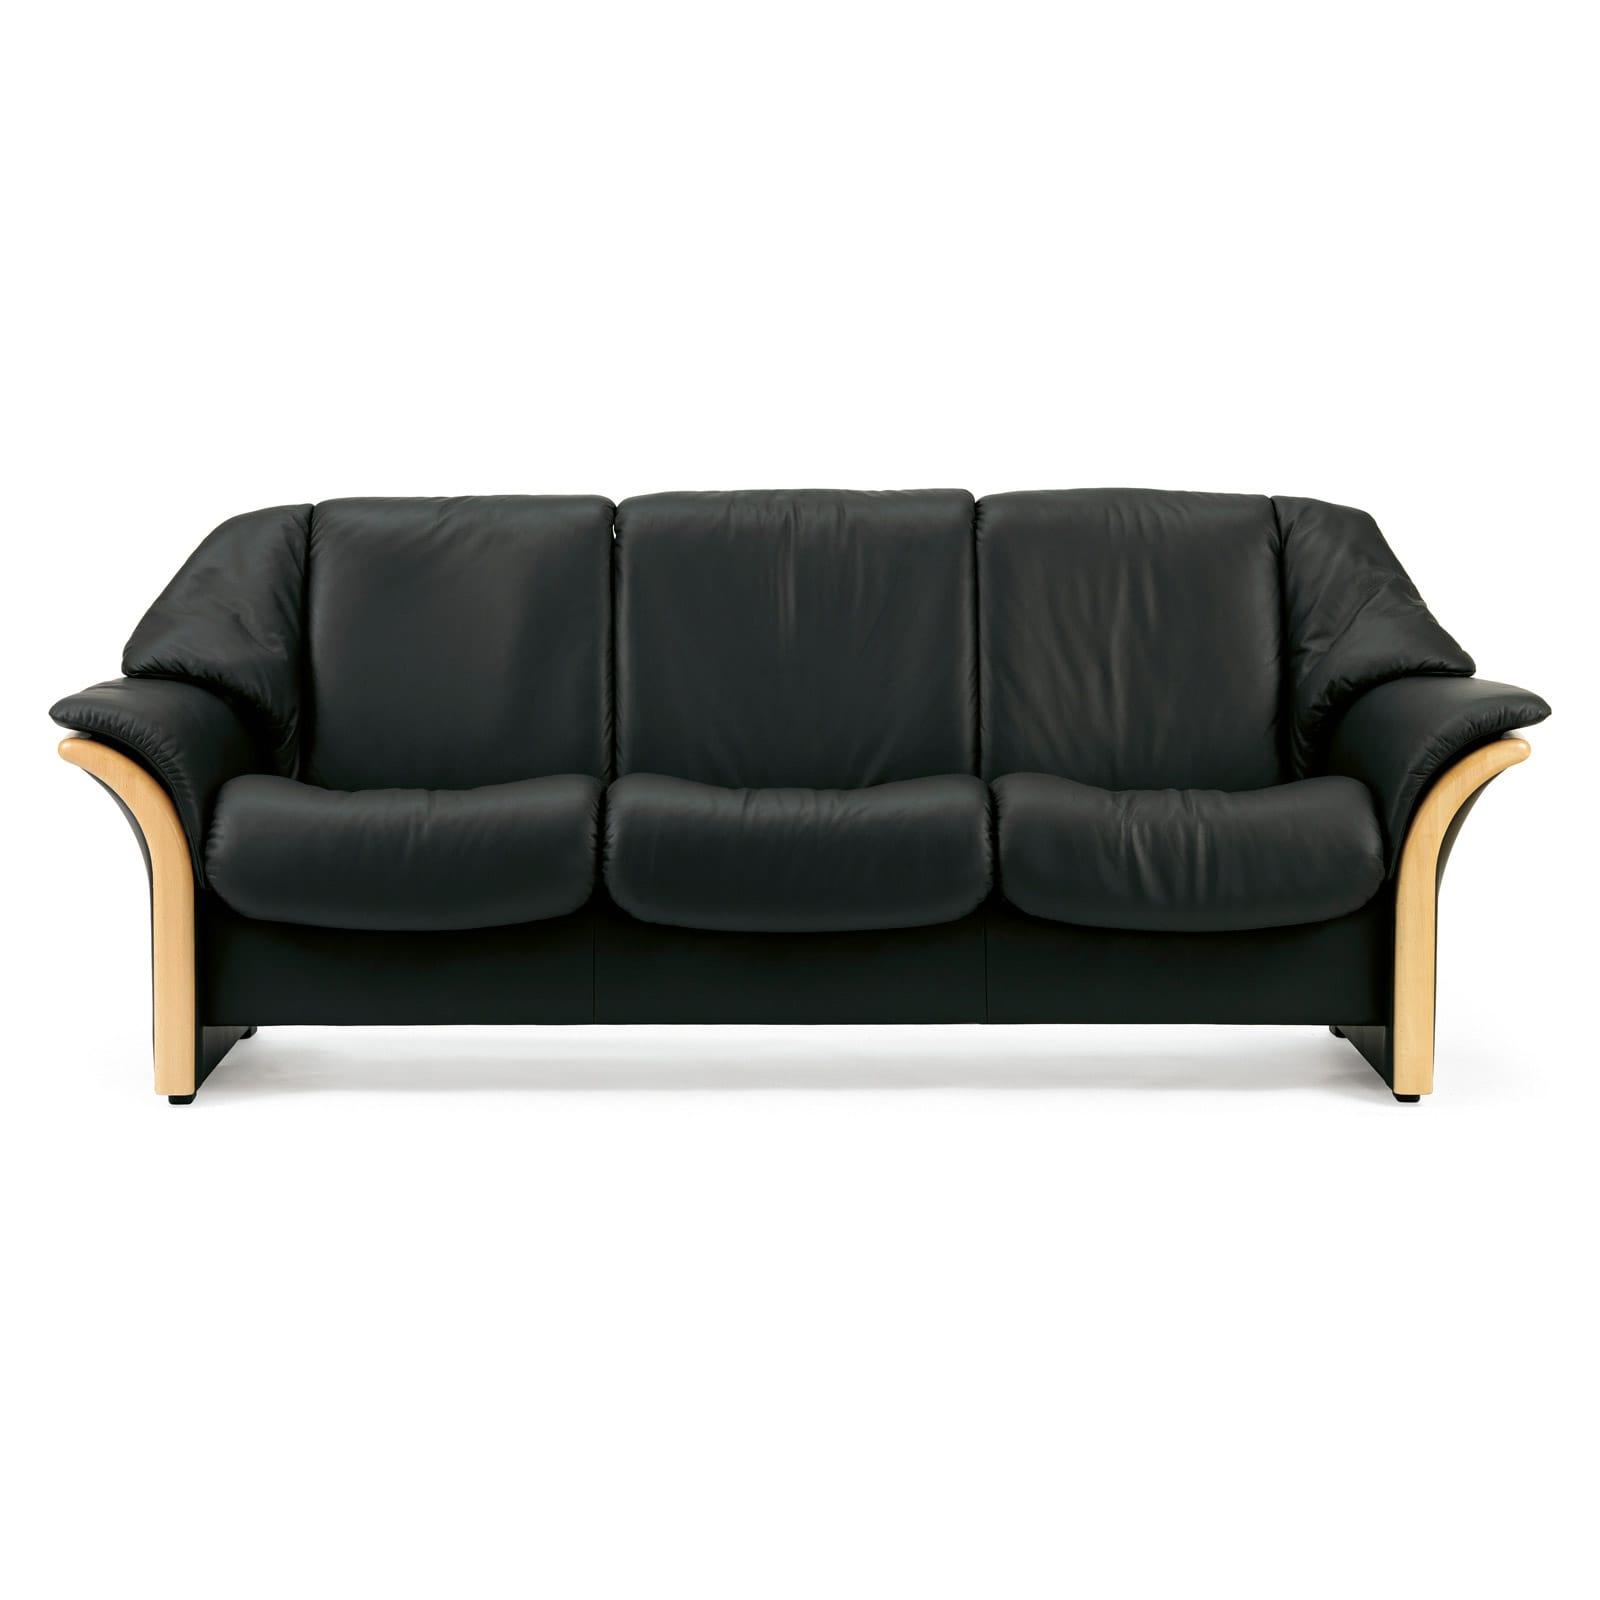 stressless sofa 3 sitzer eldorado m niedrig black natur. Black Bedroom Furniture Sets. Home Design Ideas